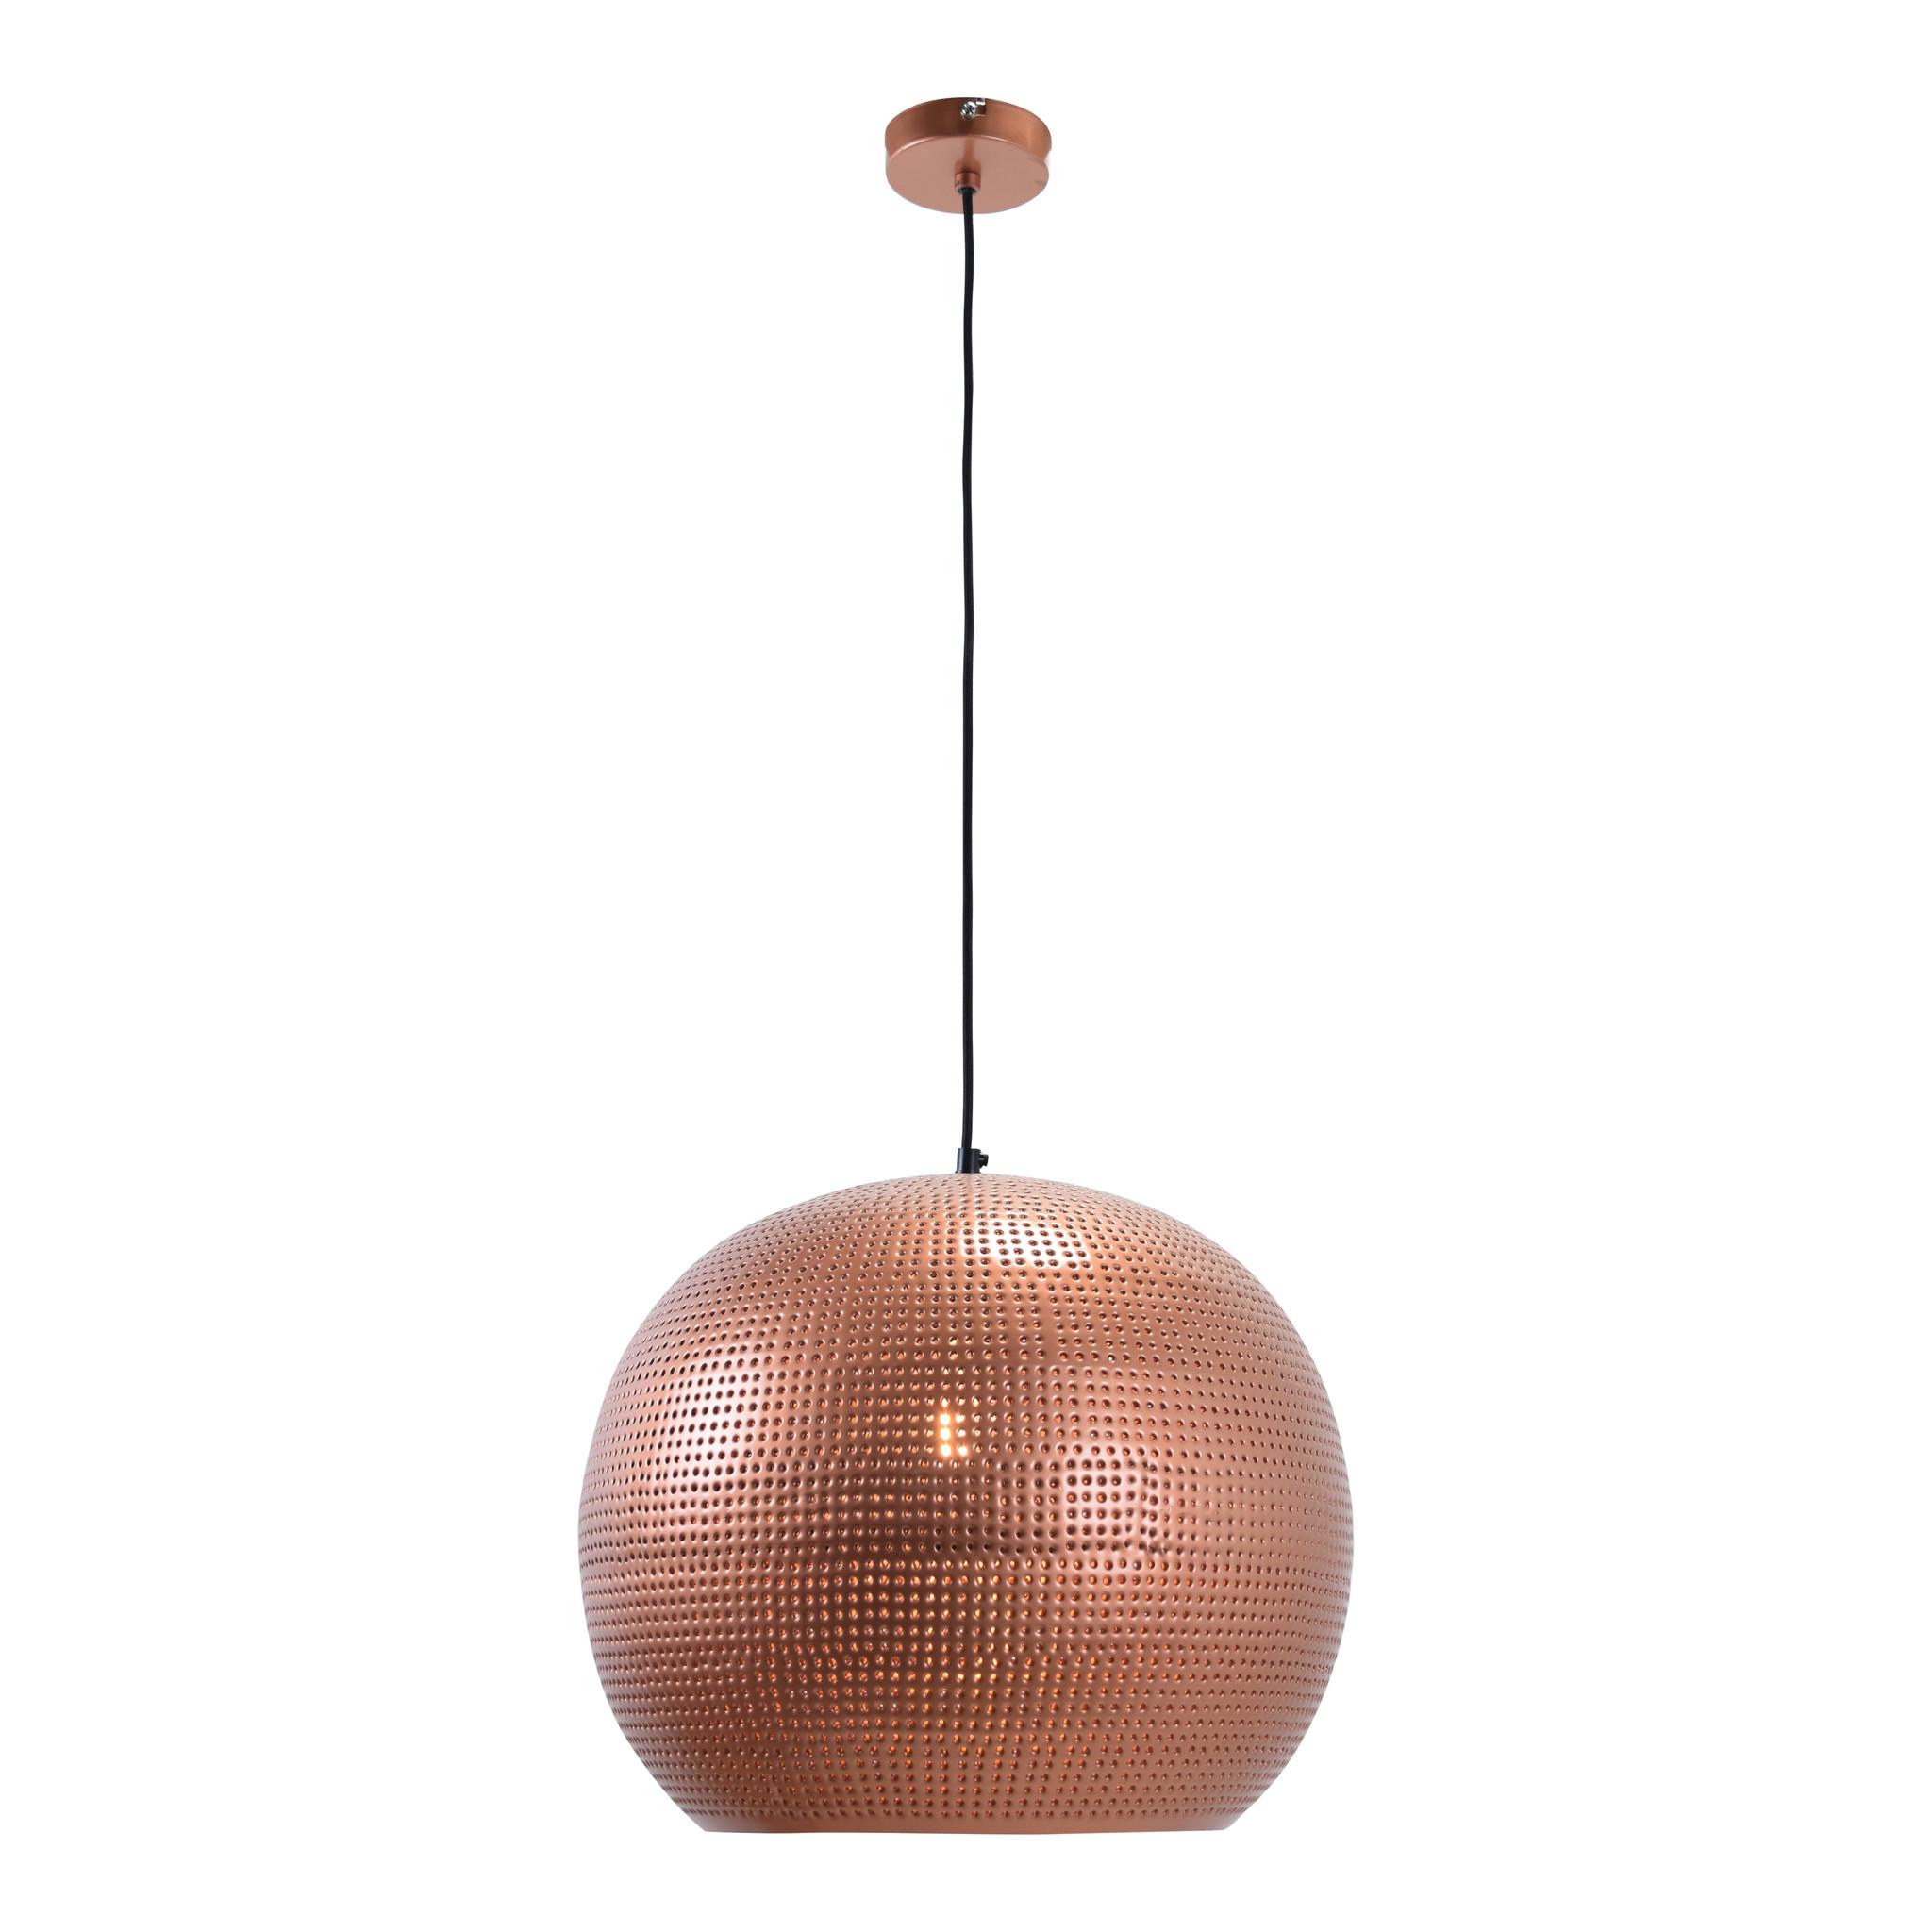 Urban Interiors Urban Interiors Hanglamp Spike bol XL ø40cm Koper-AI-PL-007B-K-8719325467154